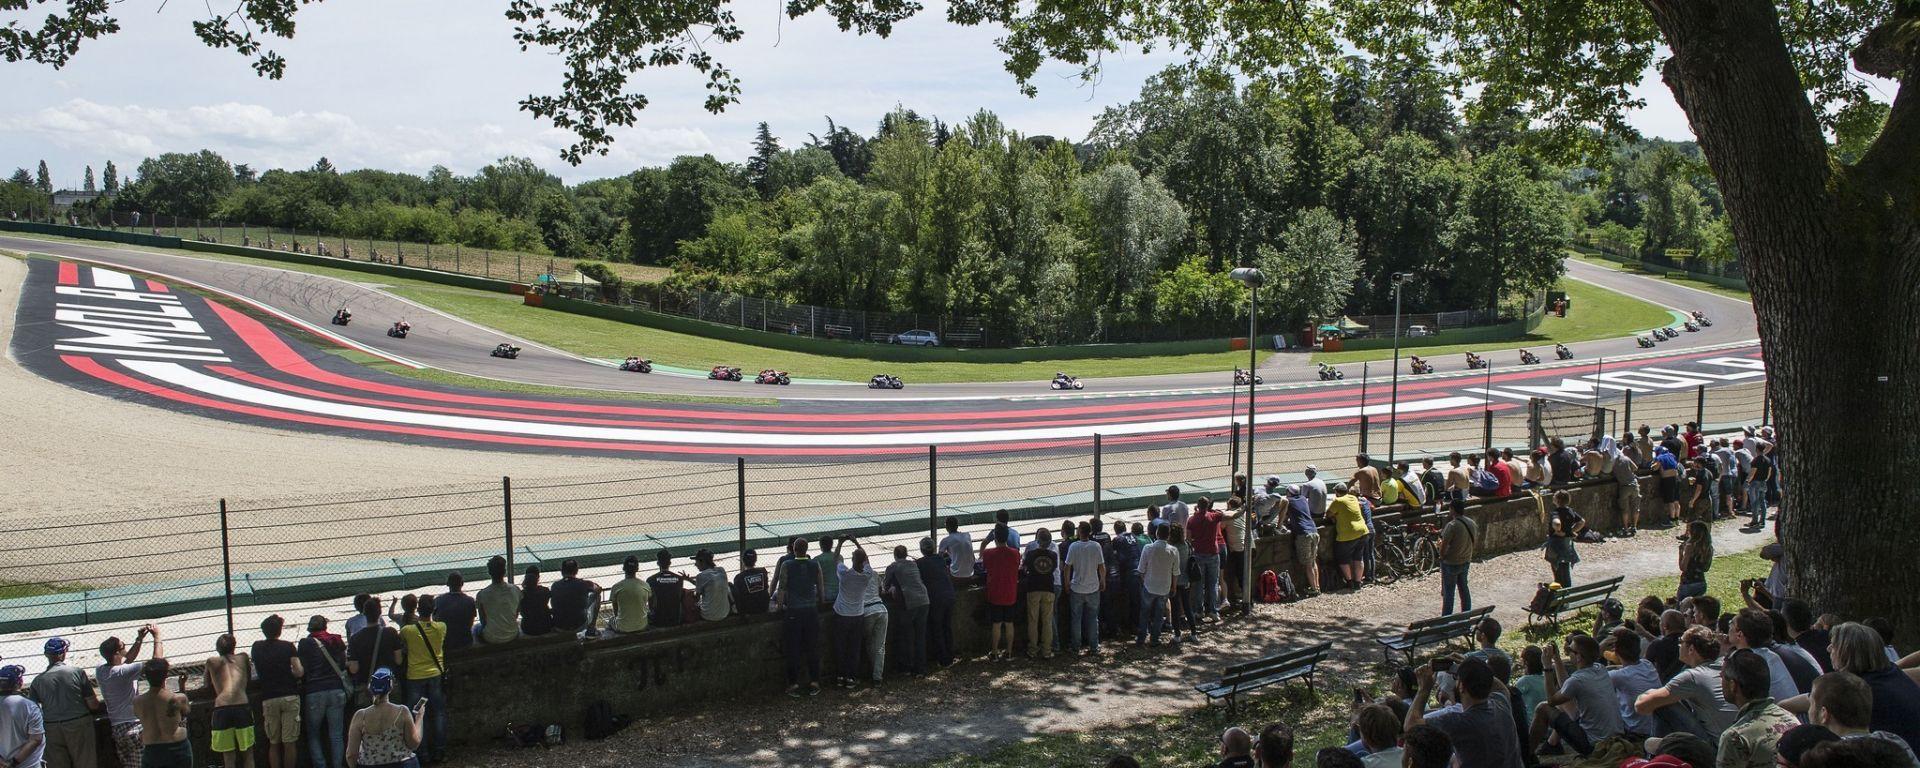 Superbike 2018 round 5 Imola: prove libere, qualifiche, Gara 1 e Gara 2